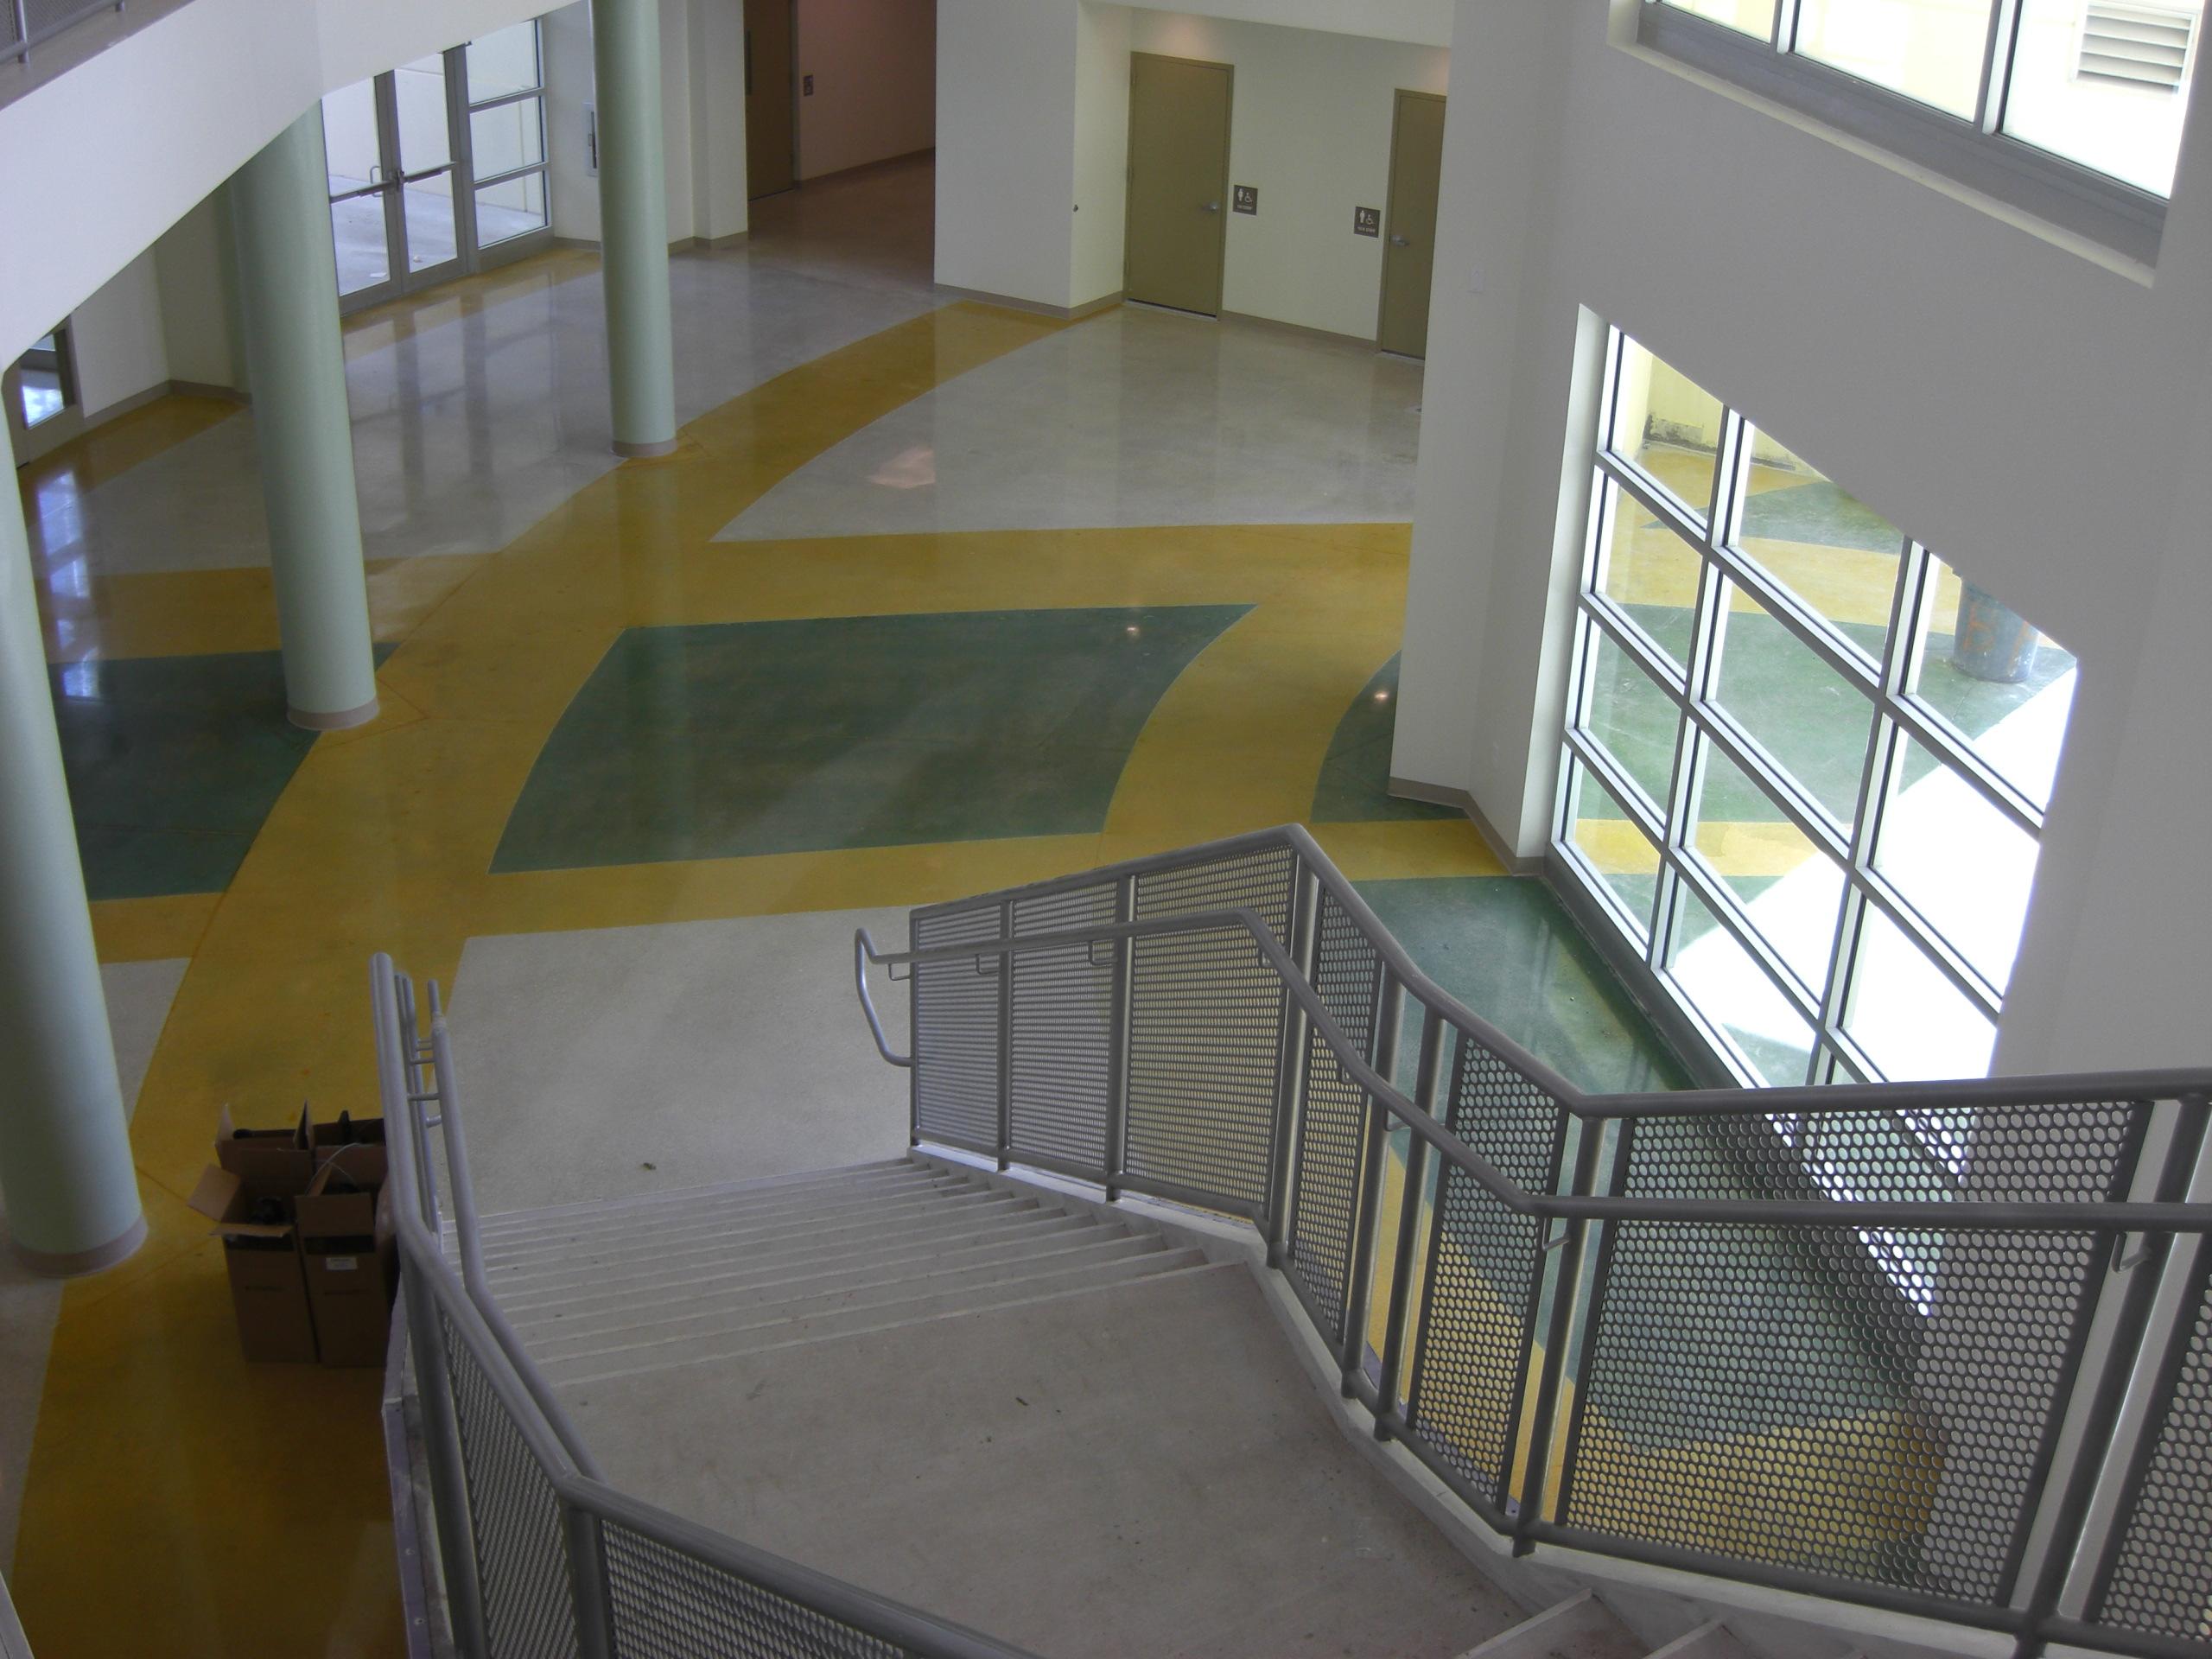 Polished Concrete Acid Etched Floors